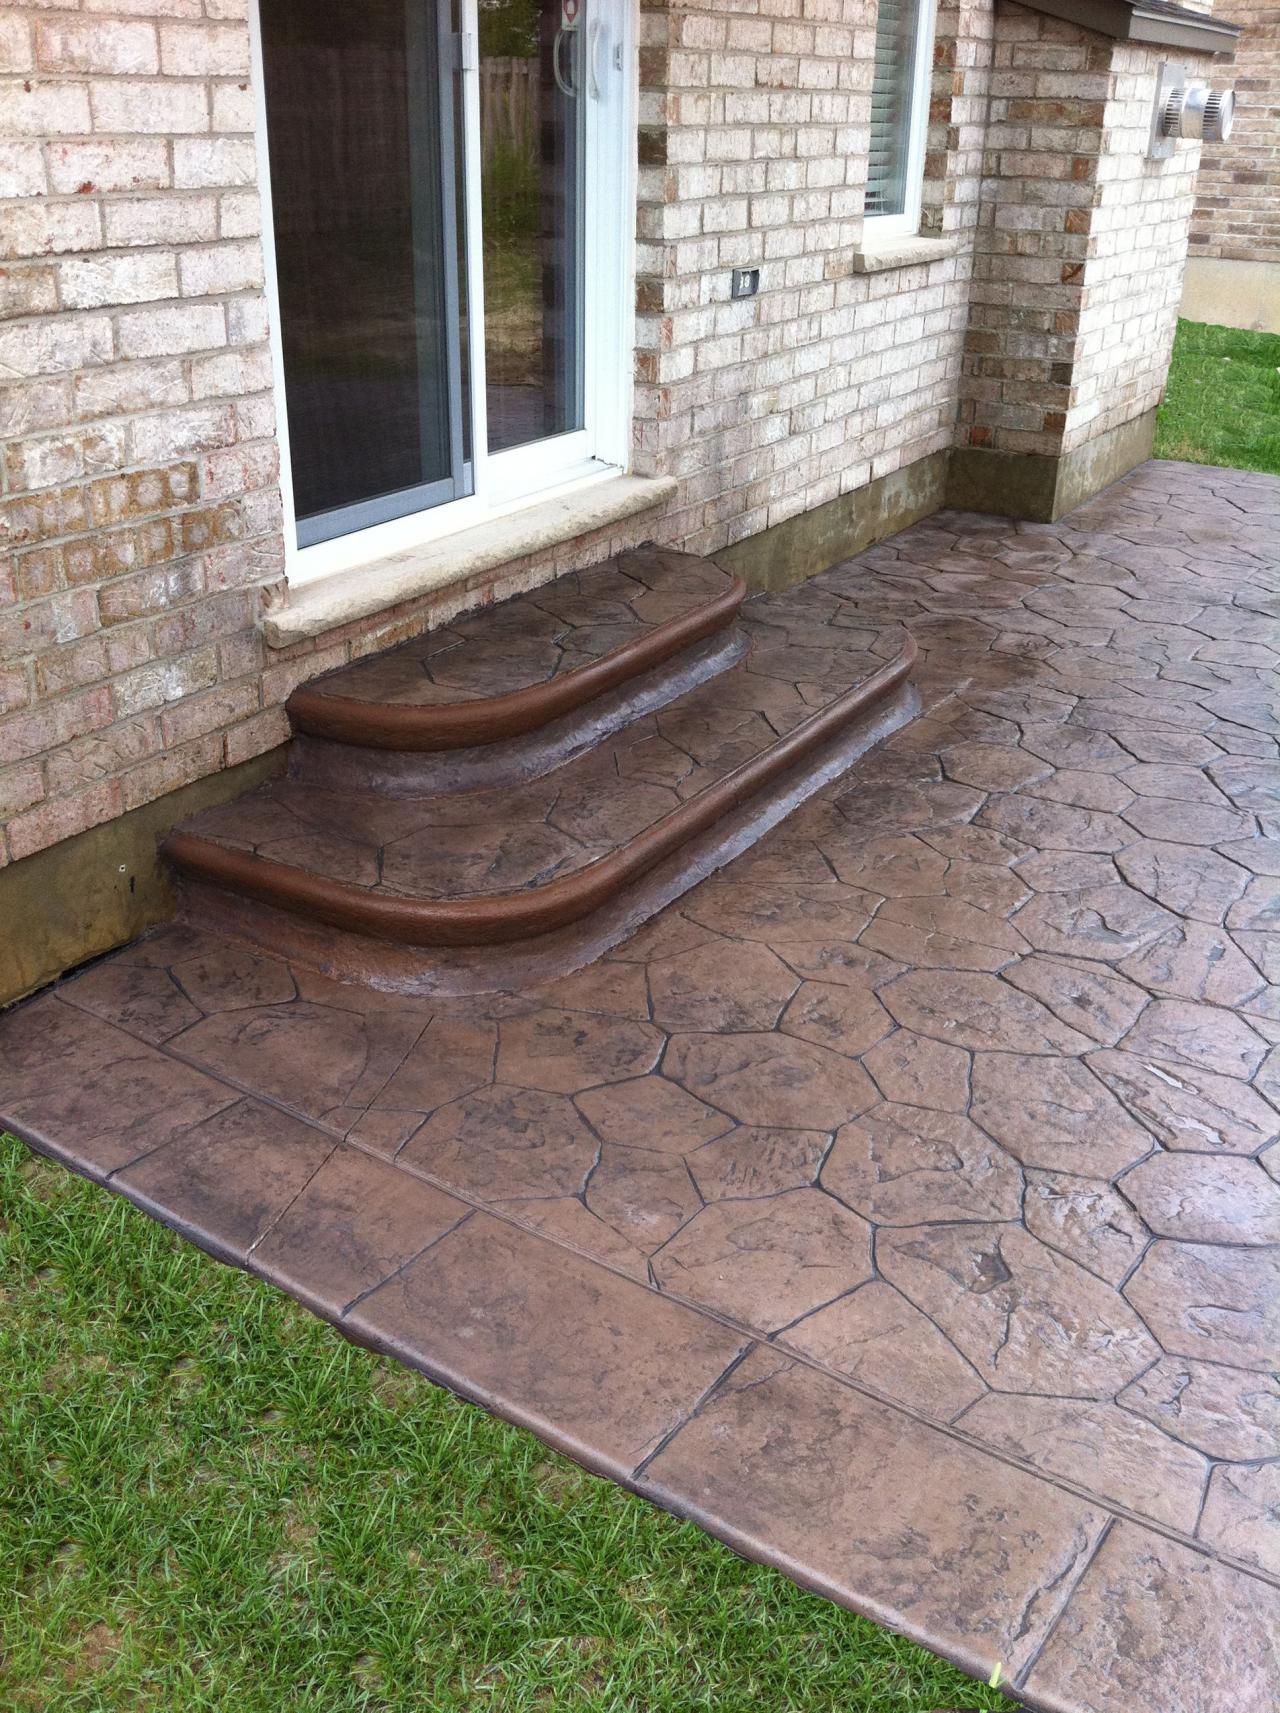 How To Build Concrete Patio Steps Thames Valley Decorative Concrete Inc. - Step Bullnose's